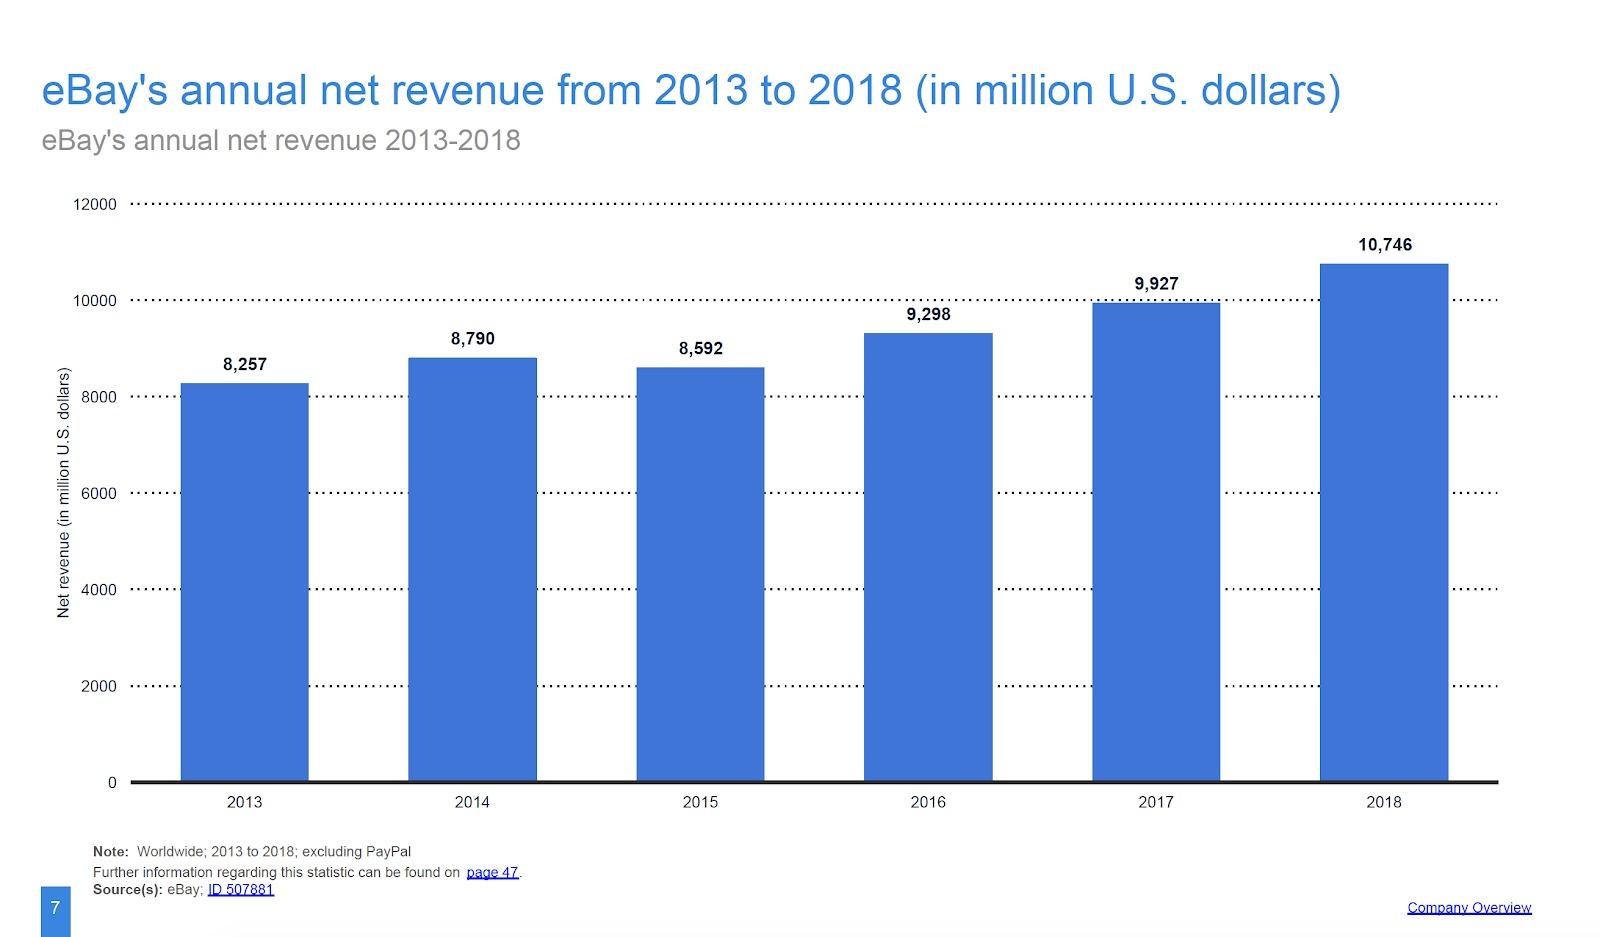 ebay entrate nette annuali